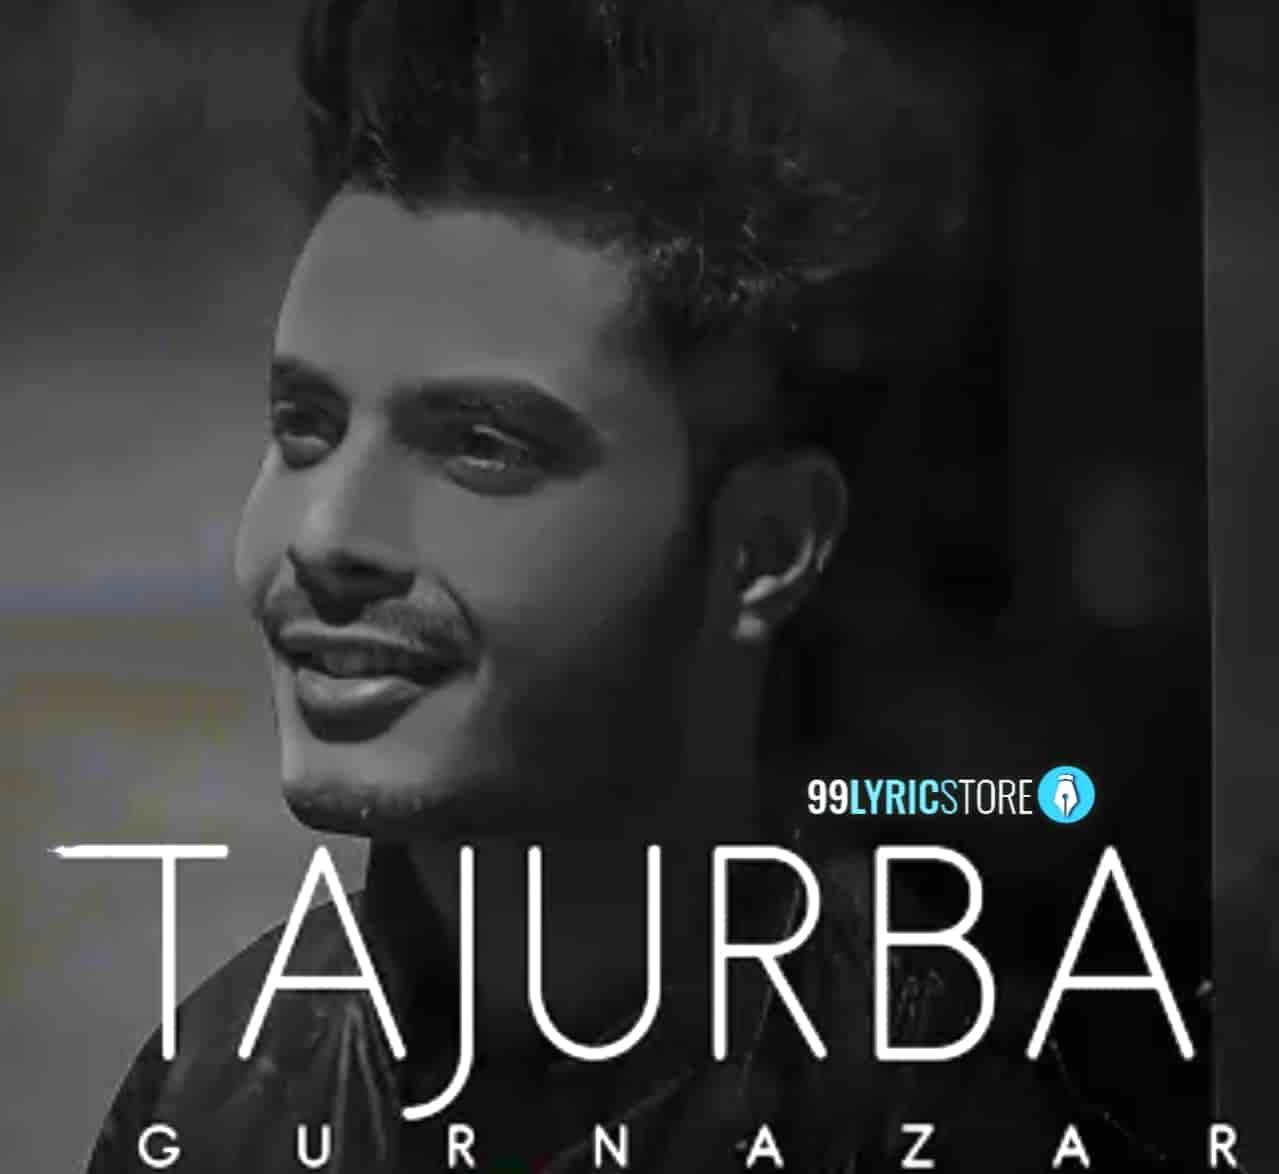 Tajurba Punjabi Song Images By Gurnazar